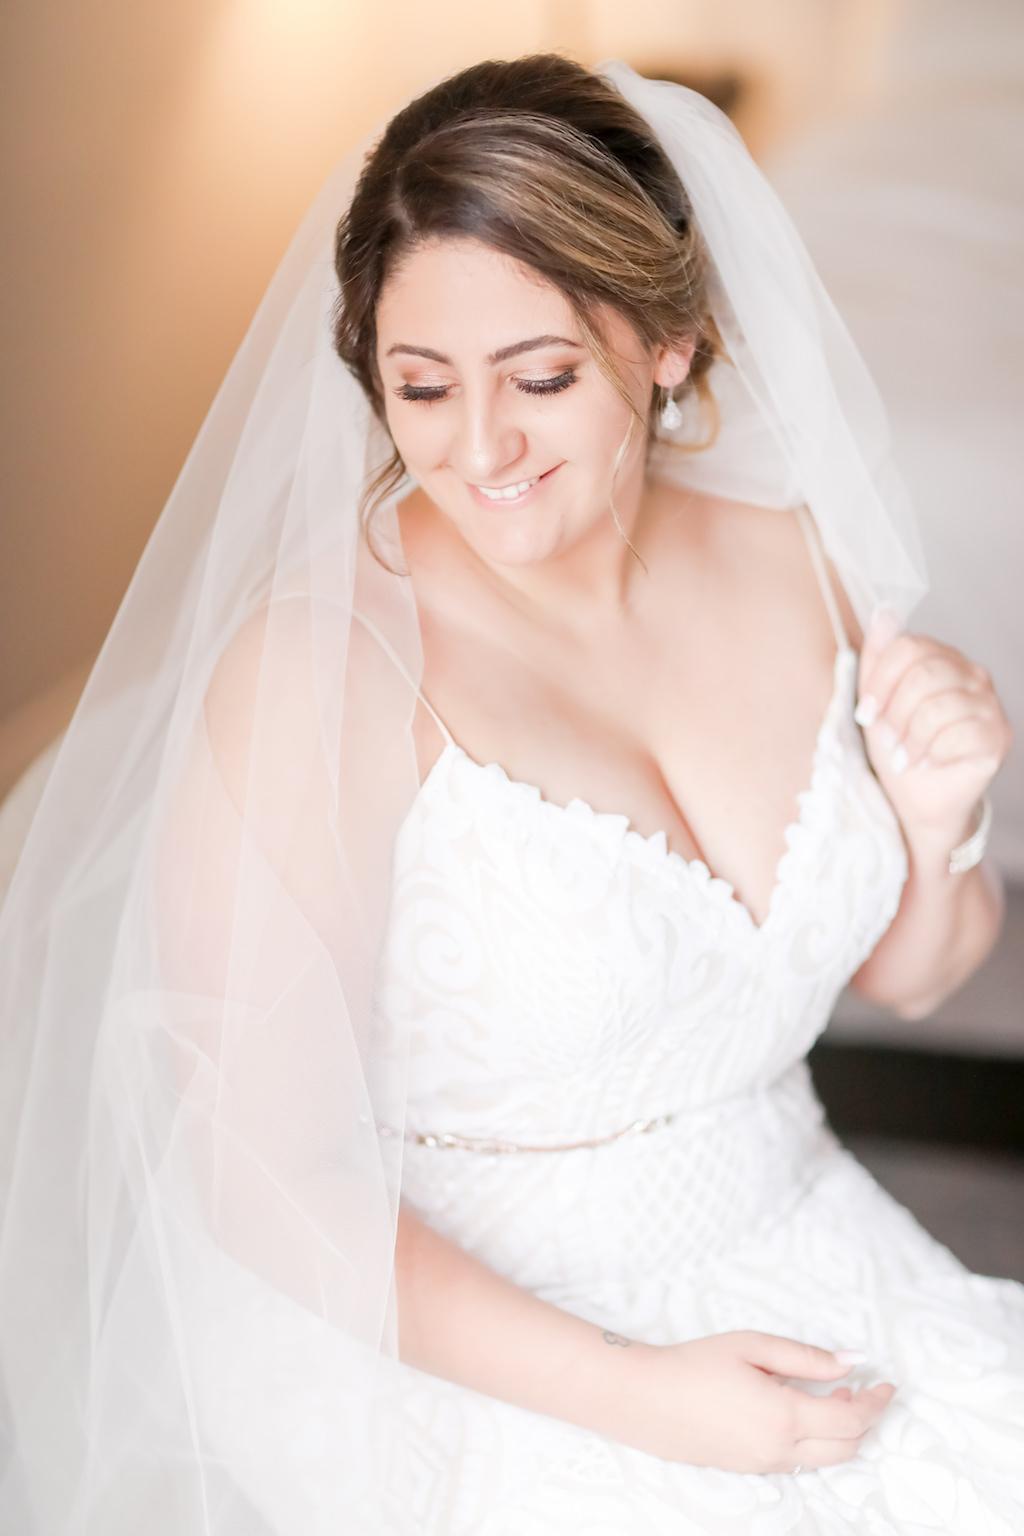 Florida Beauty Bridal Portrait, Spaghetti Strap Lace V Neckline Wedding Dress with Belt and Long Veil   Tampa Bay Wedding Photographer Lifelong Photography Studios